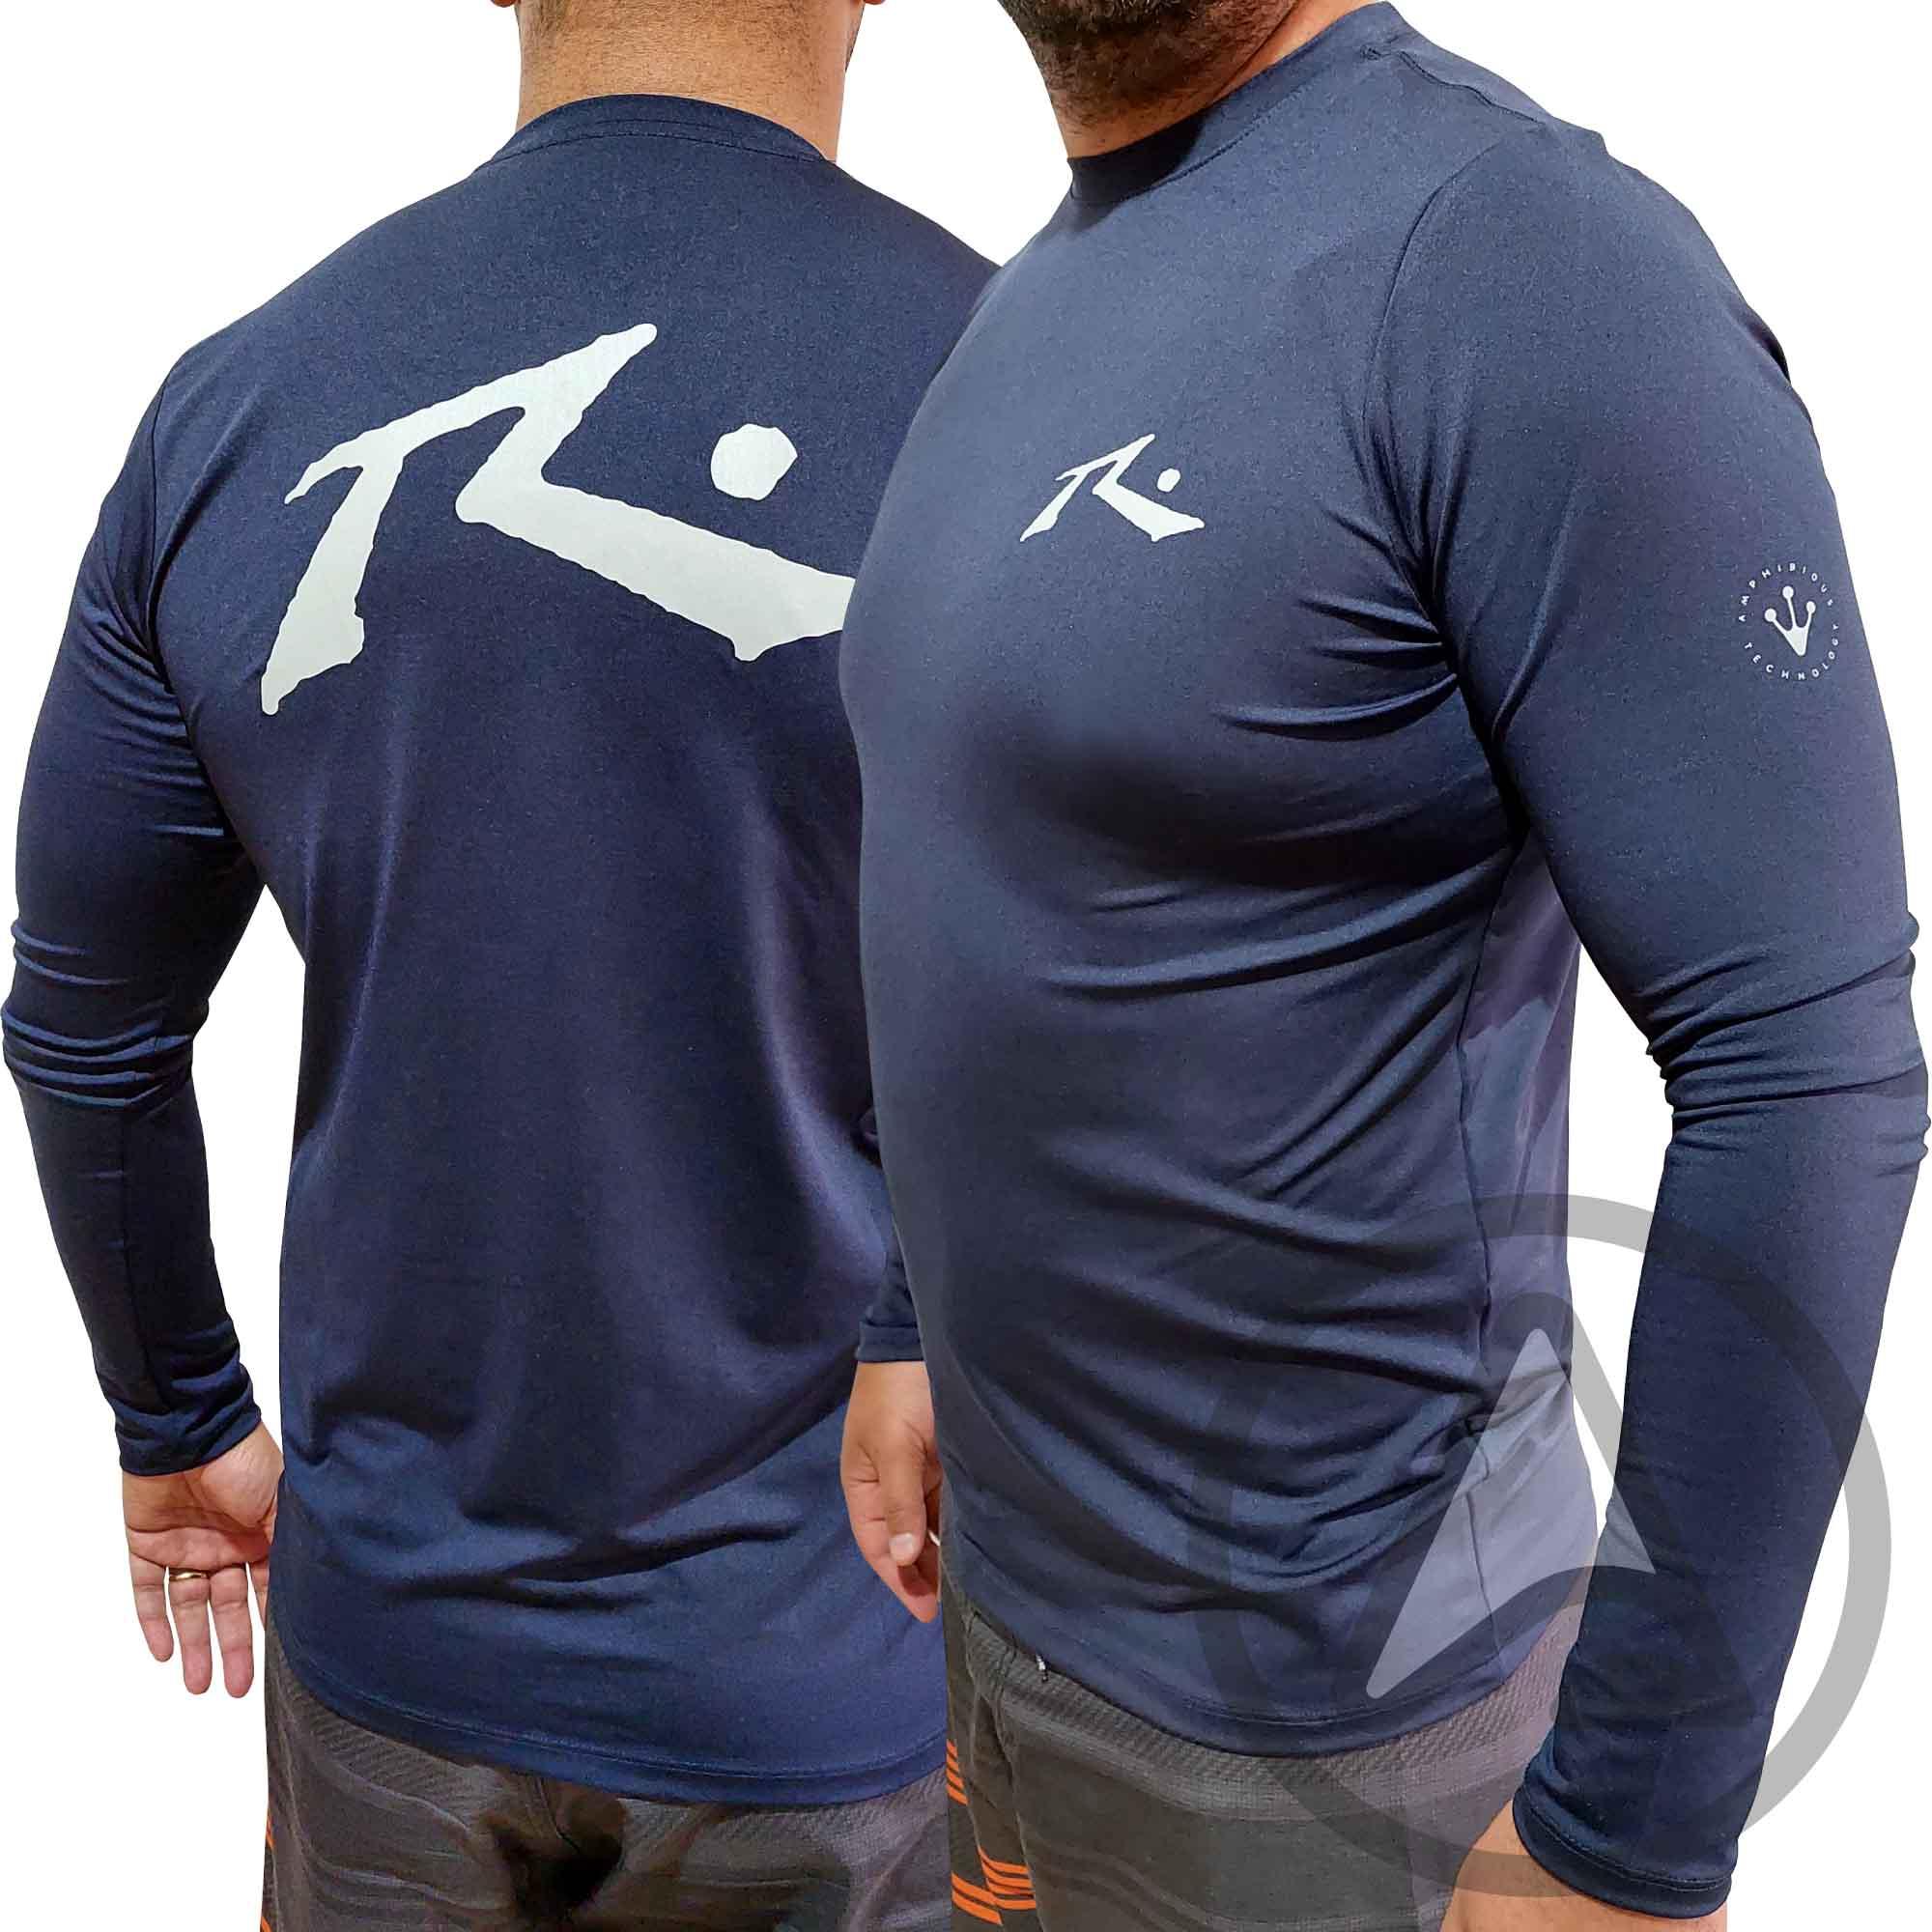 Camiseta de Lycra RUSTY AMPHIBIOUS